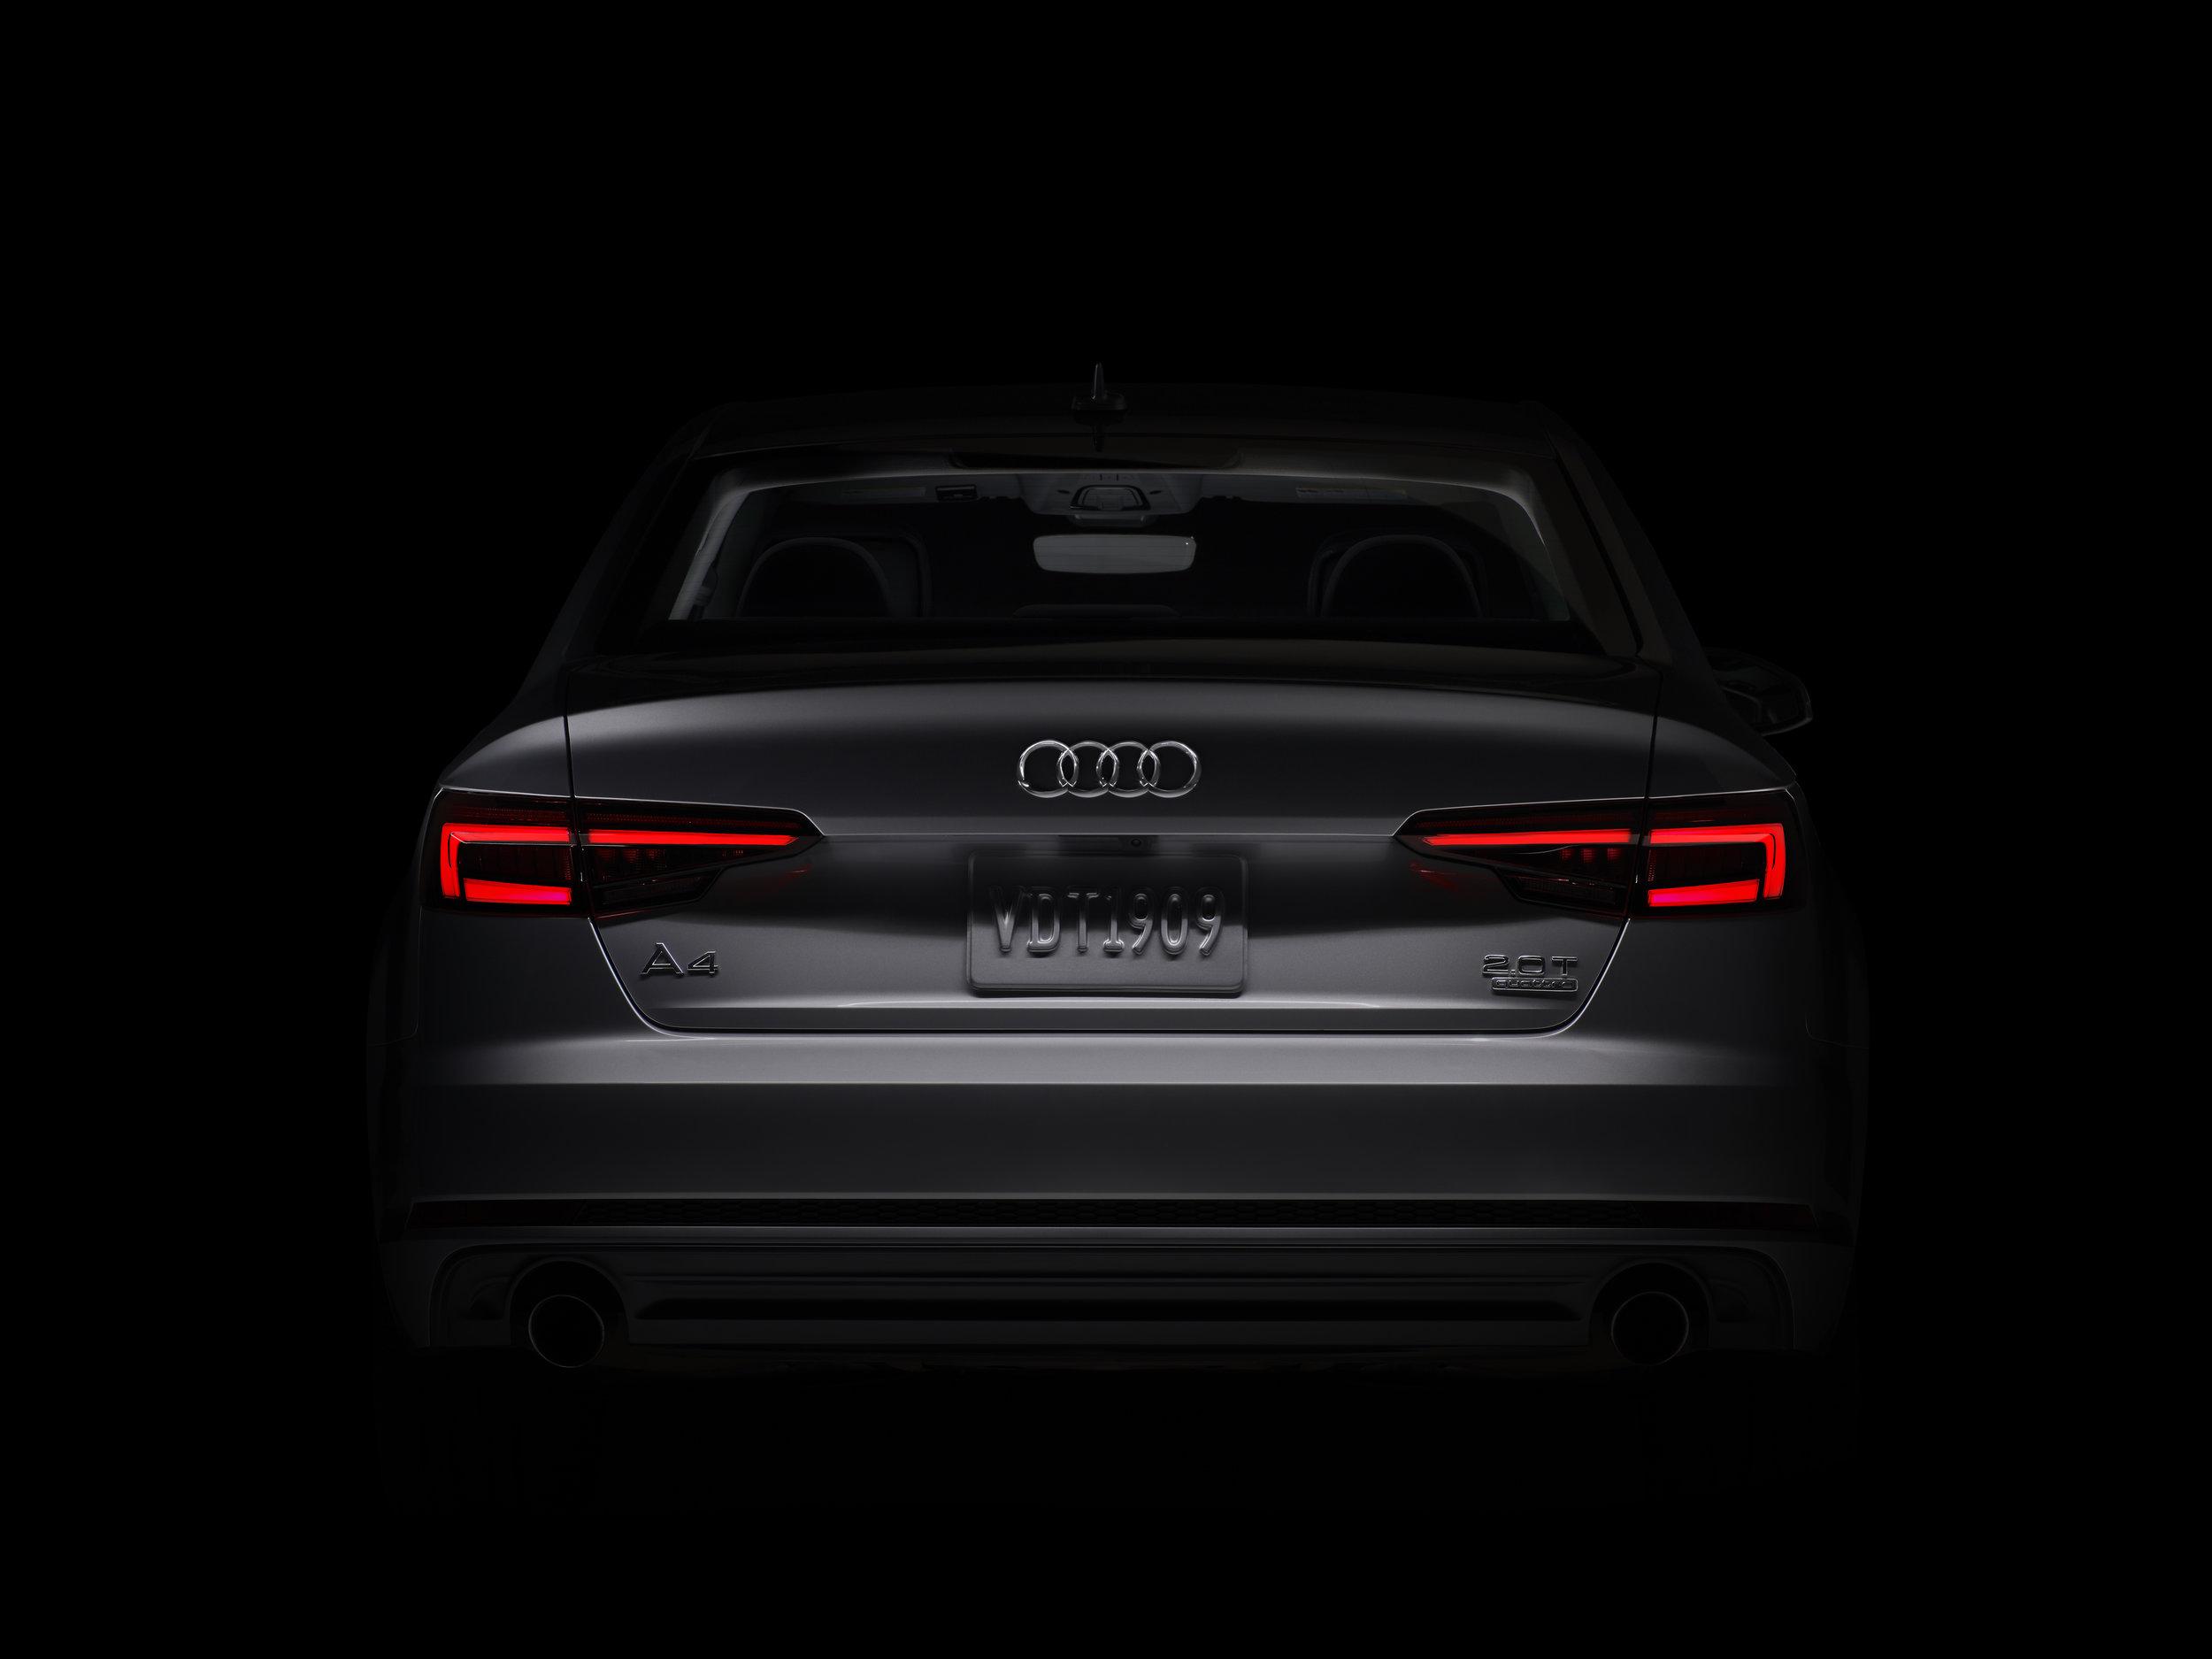 Audi_A4_In_The_Spotlight_D2_10.jpg